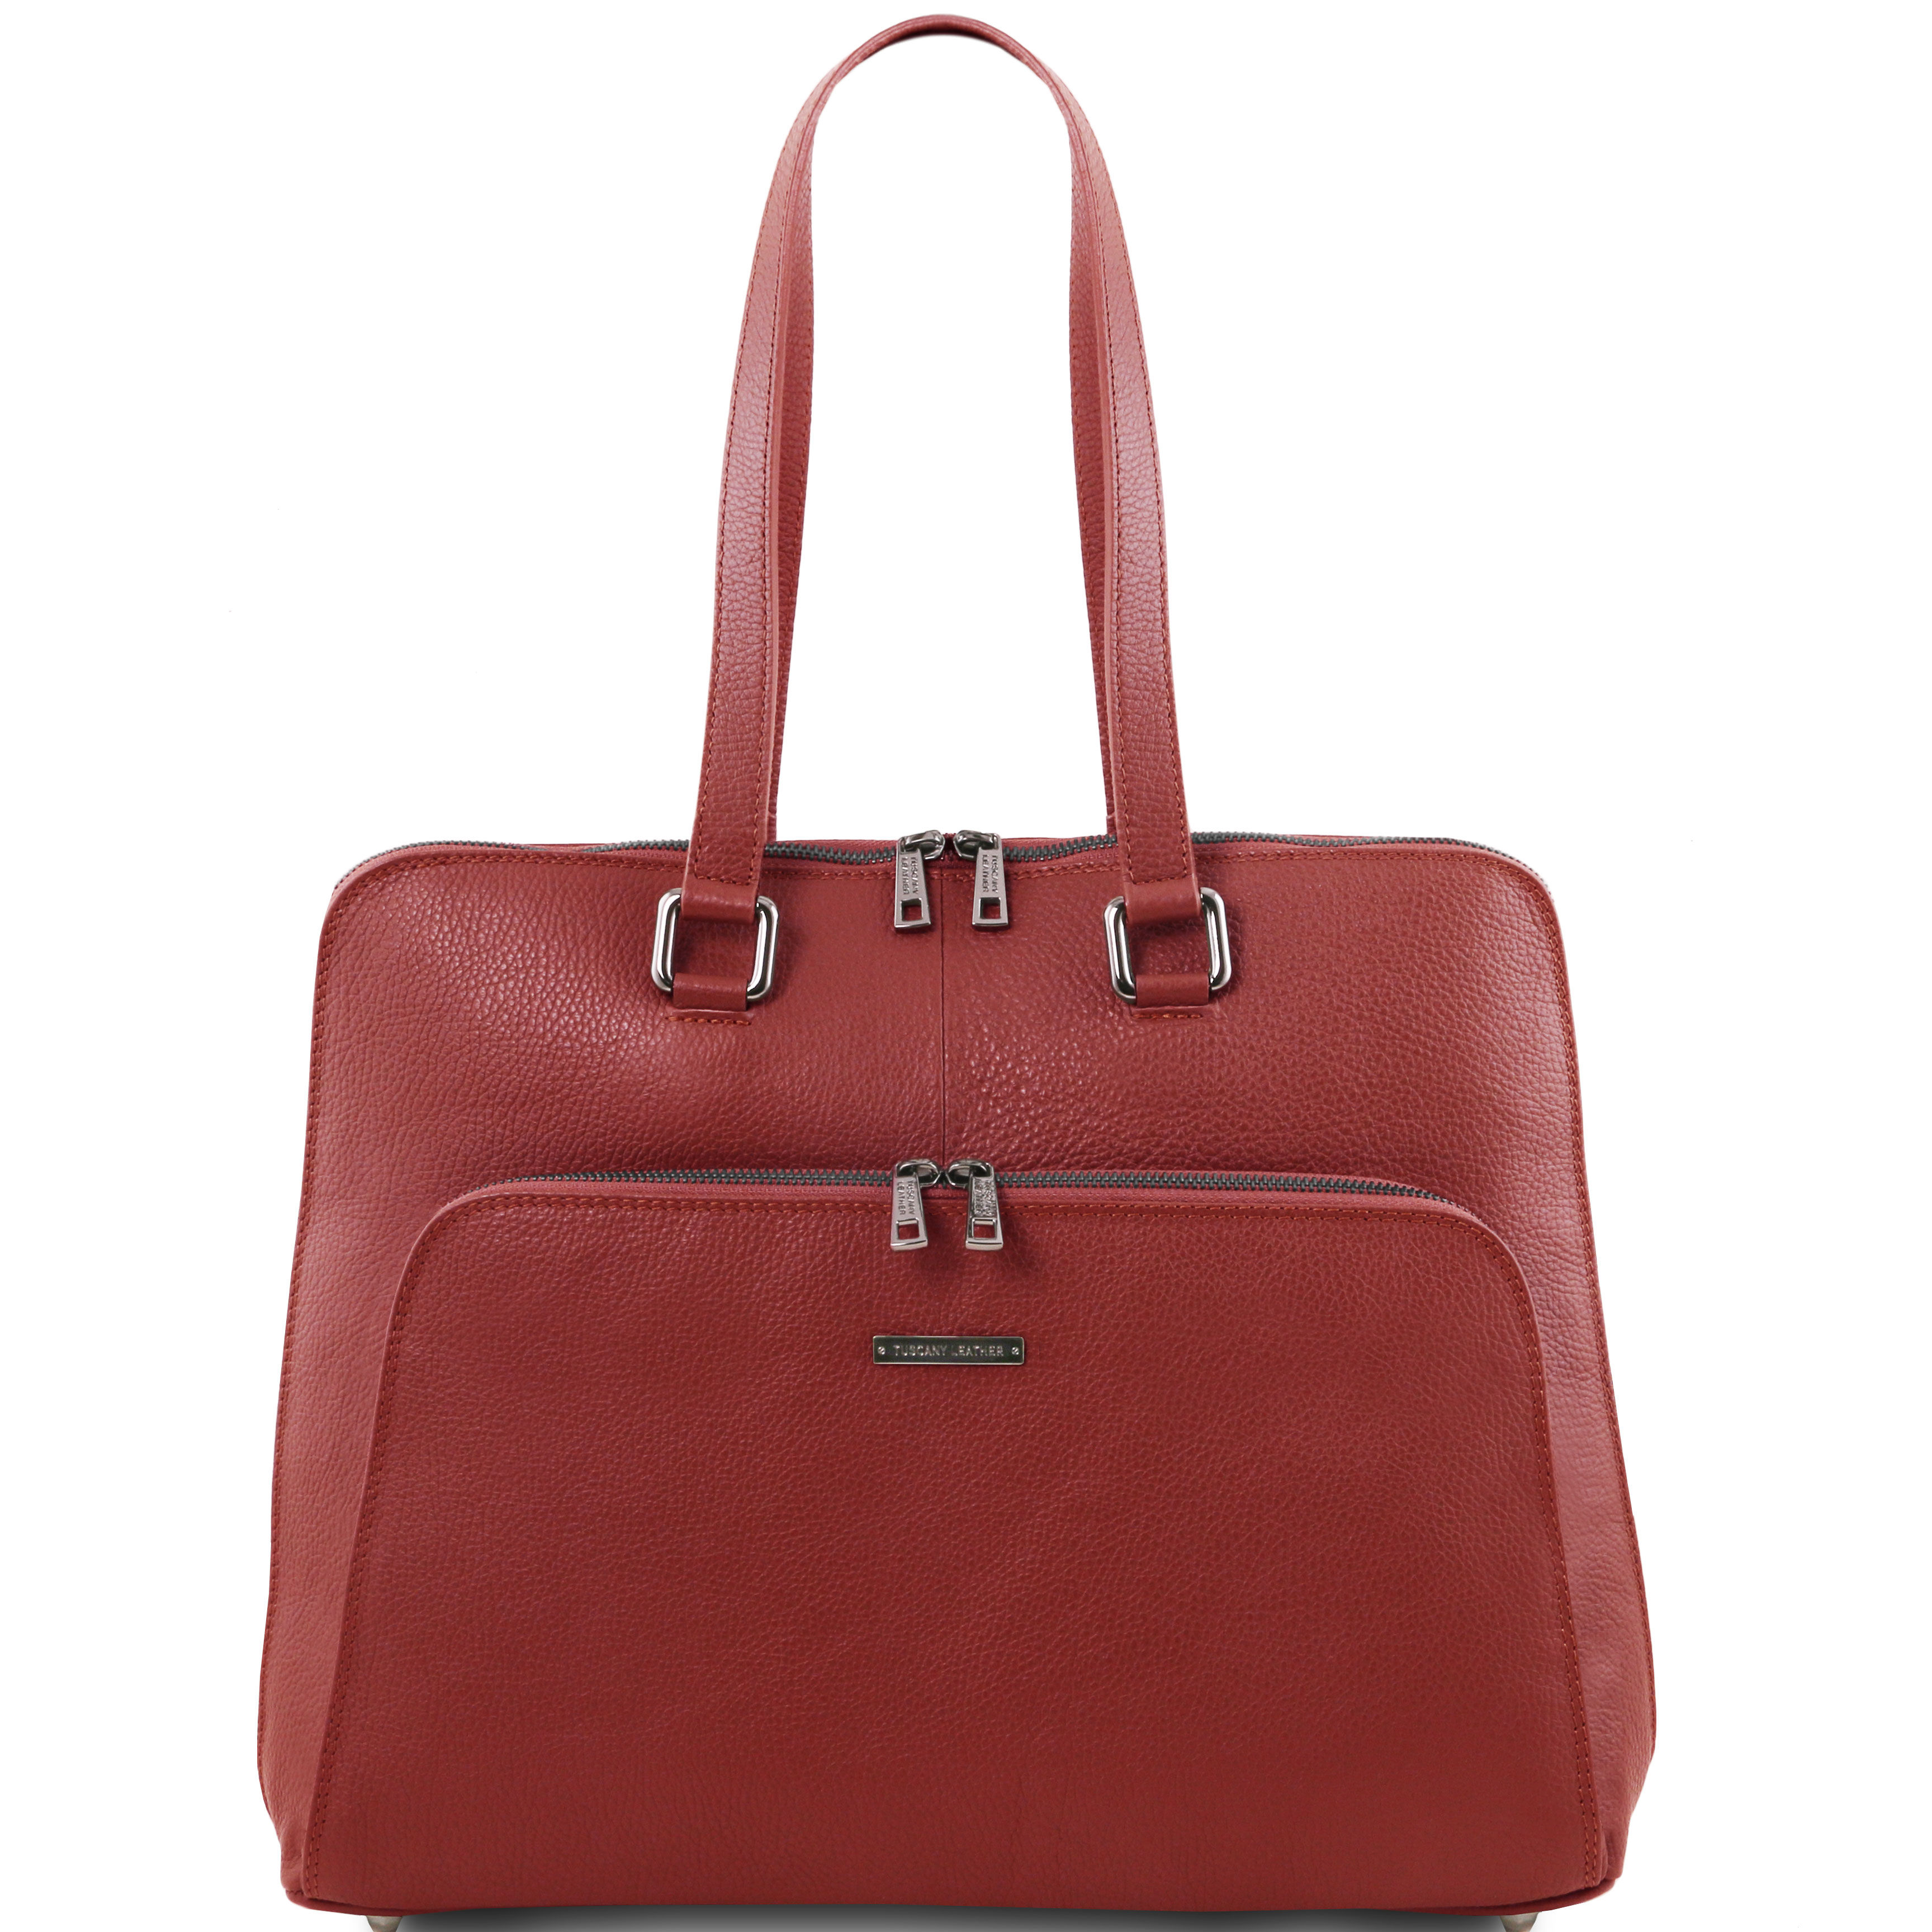 LUCCA - TL SMART Geanta business rosie piele soft